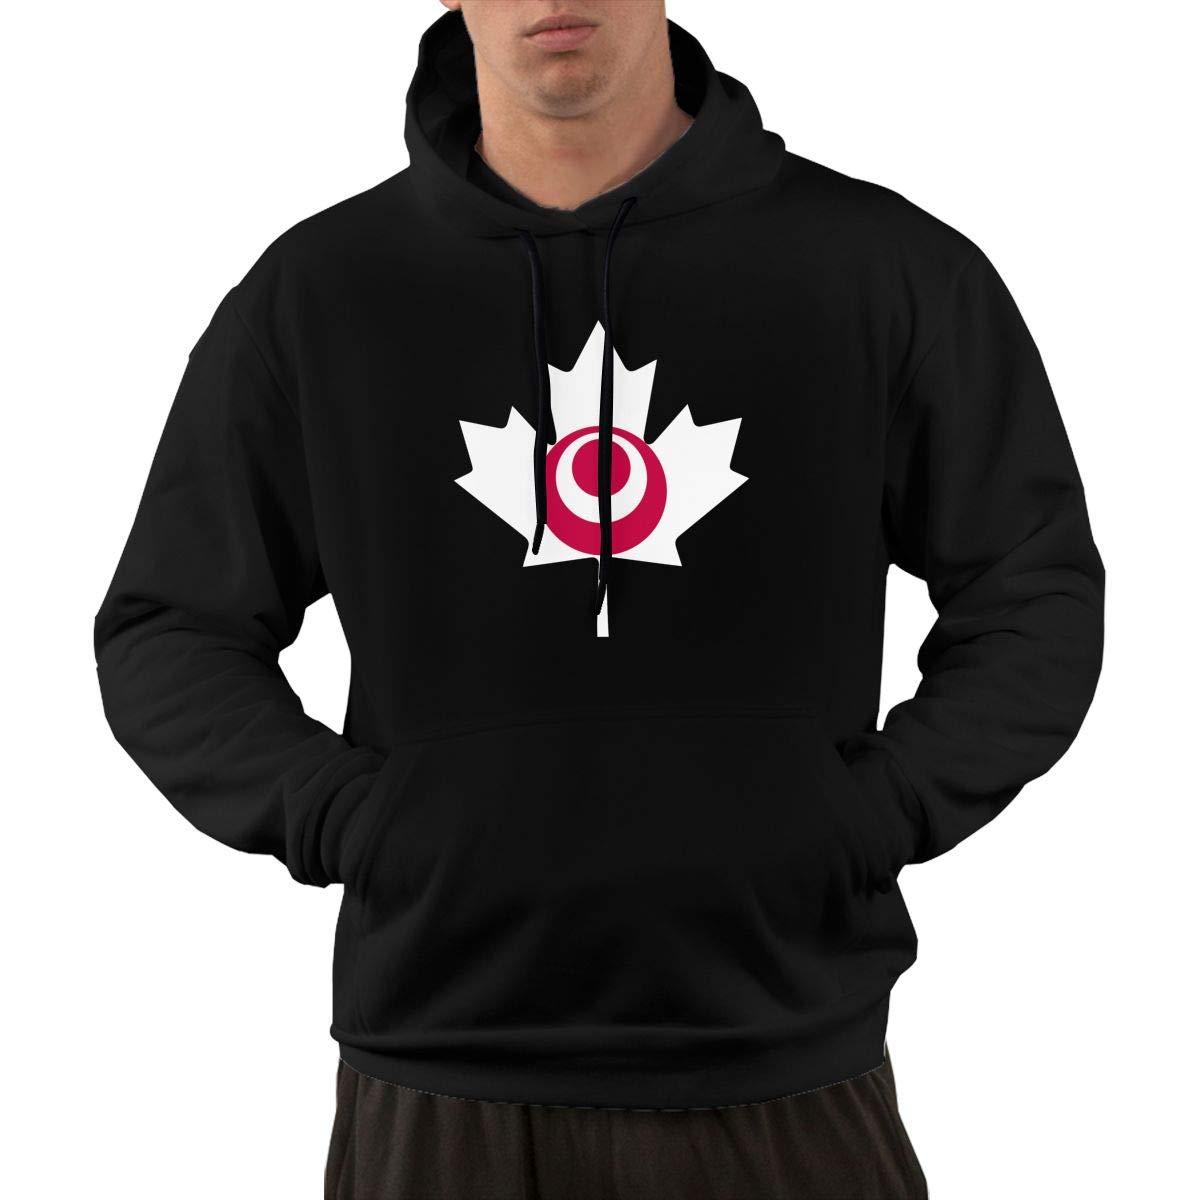 Okinawa Flag Canada Maple Leaf-1 Sweater with Kanga Pocket Mens Sports Fleece Hoodies